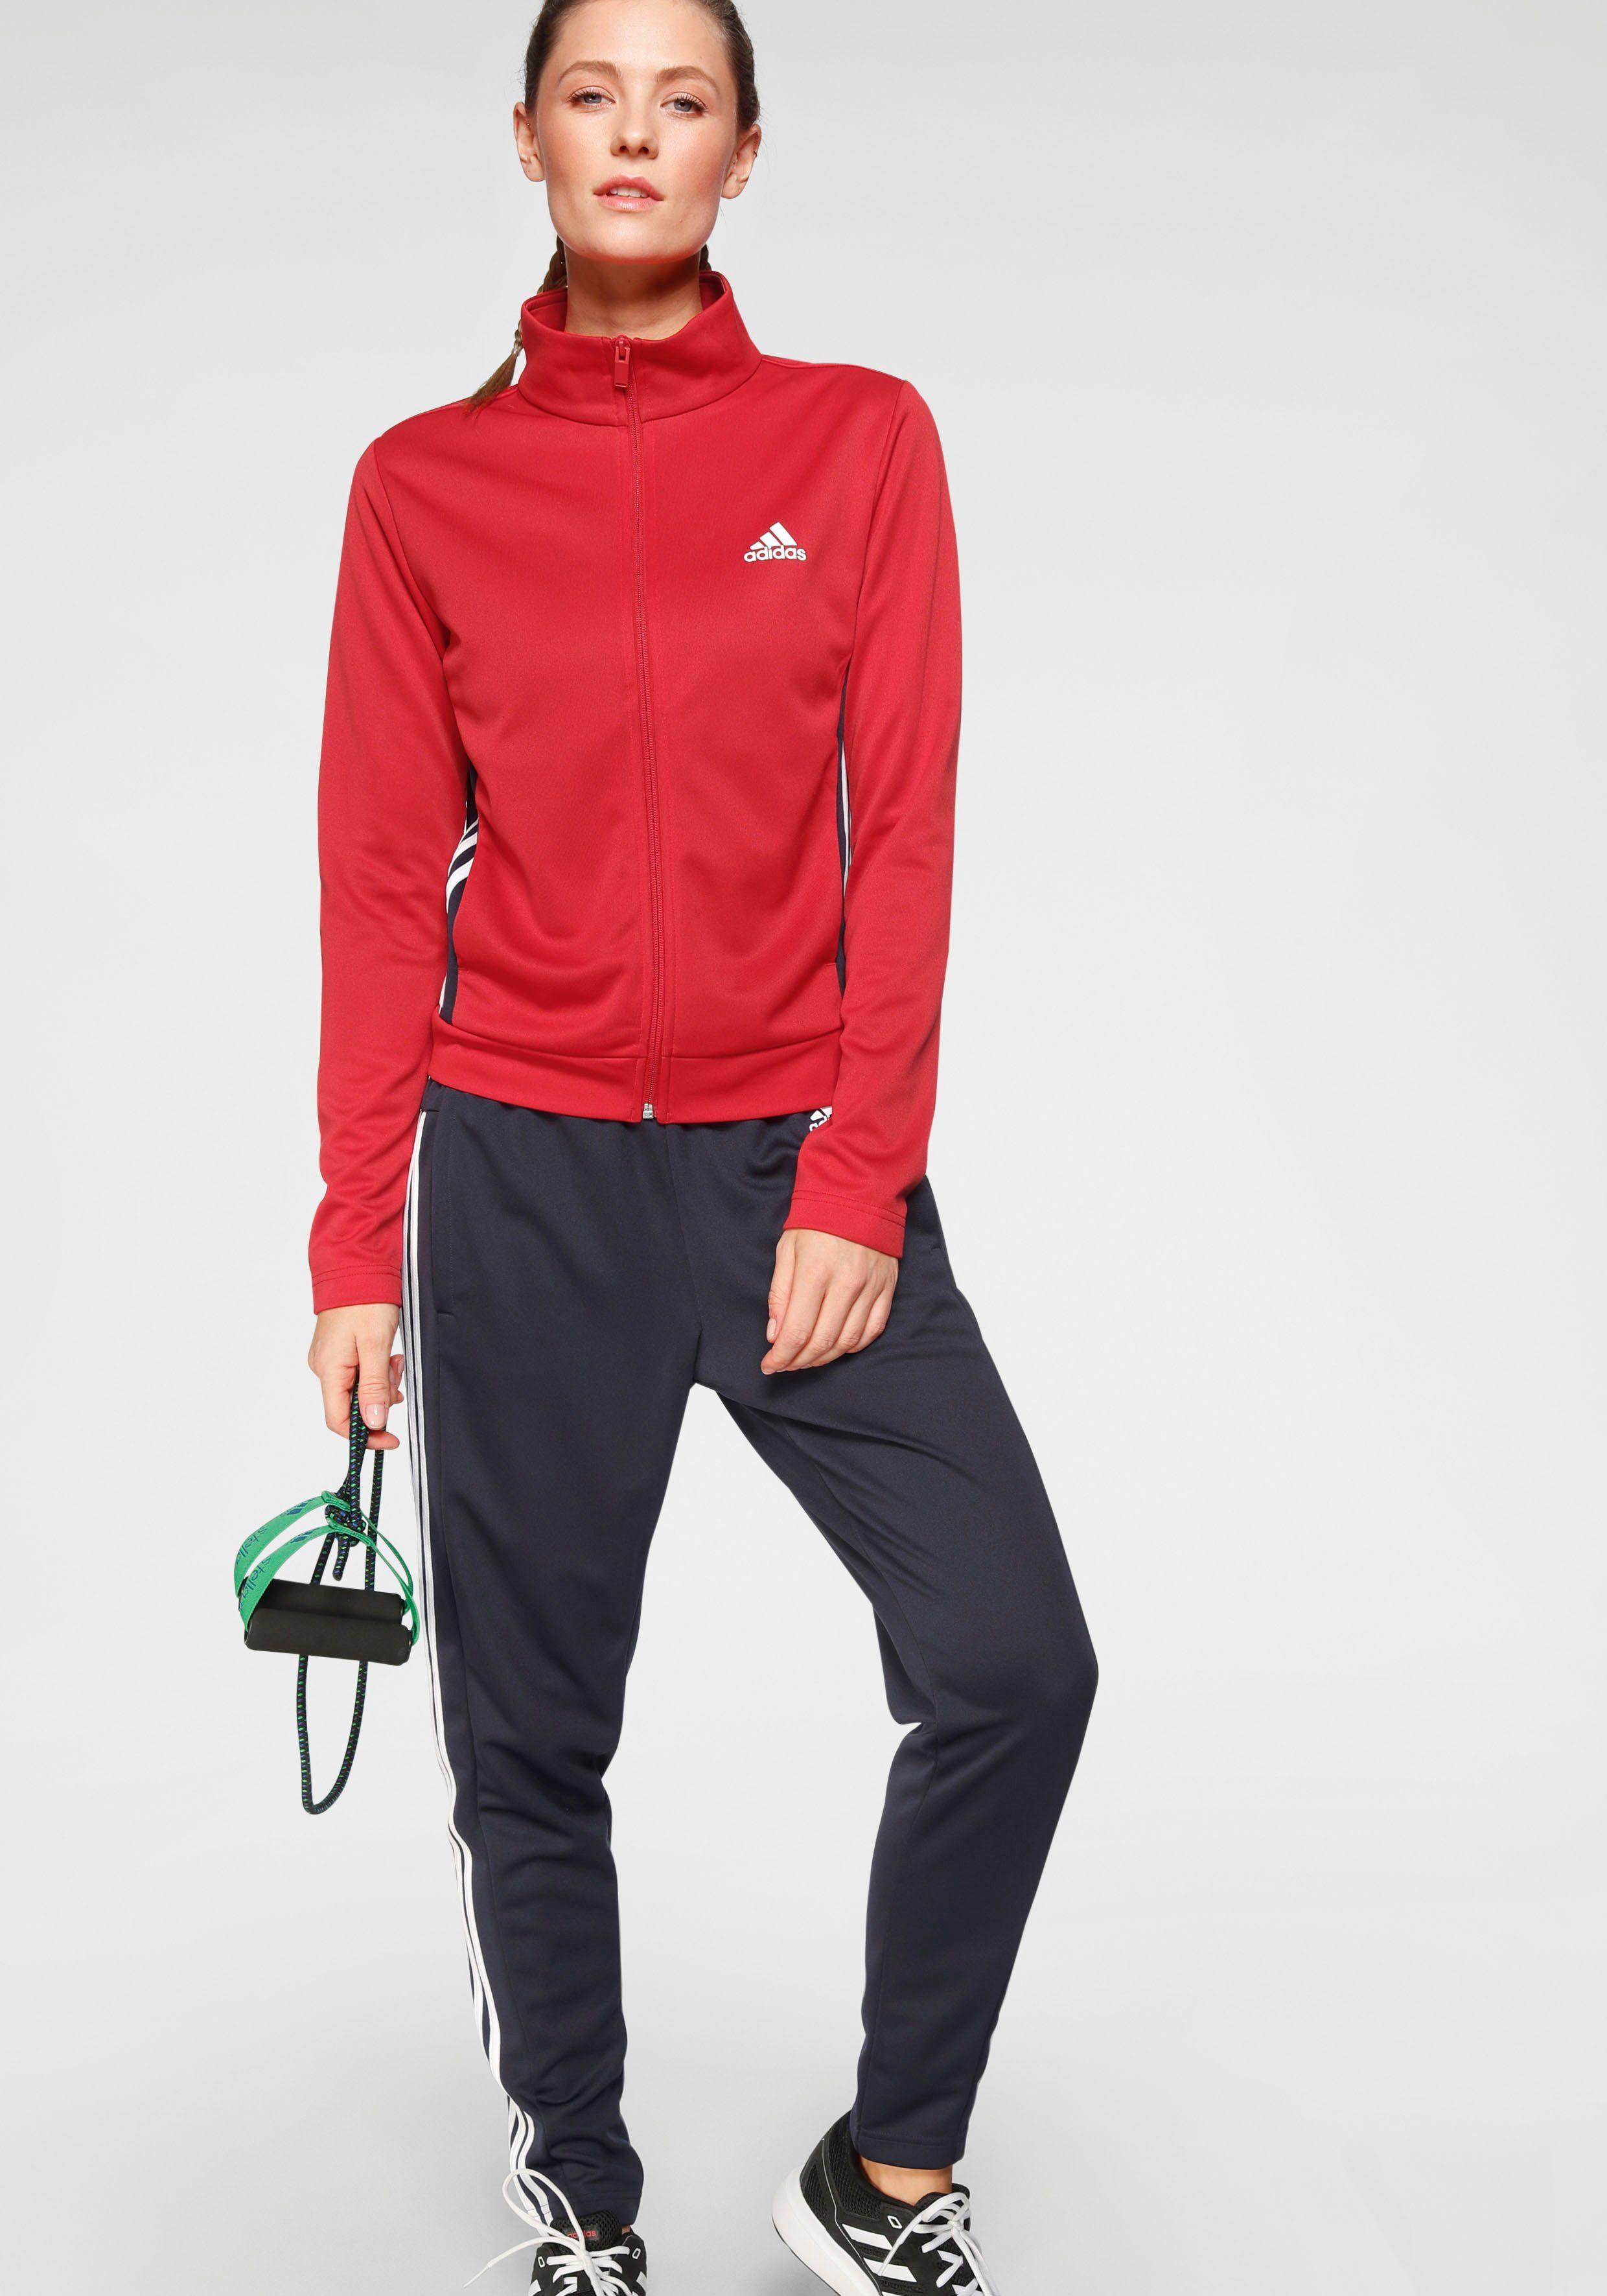 adidas Performance Trainingsanzug »TRACKSUIT TEAMSPORT« online kaufen   OTTO